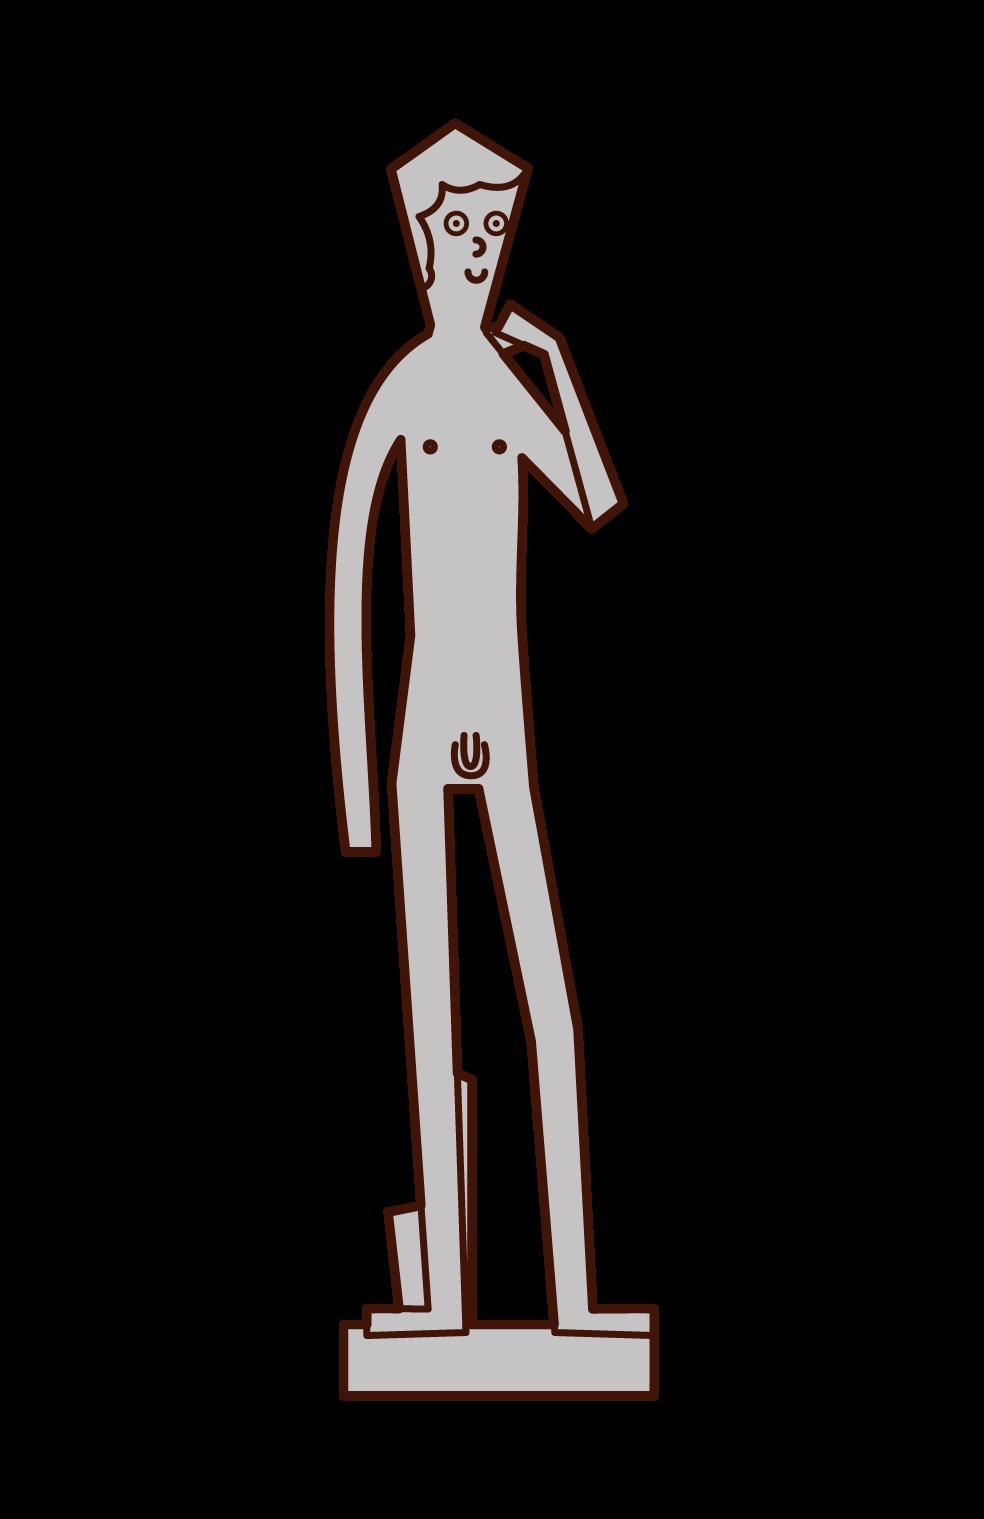 Illustration of David